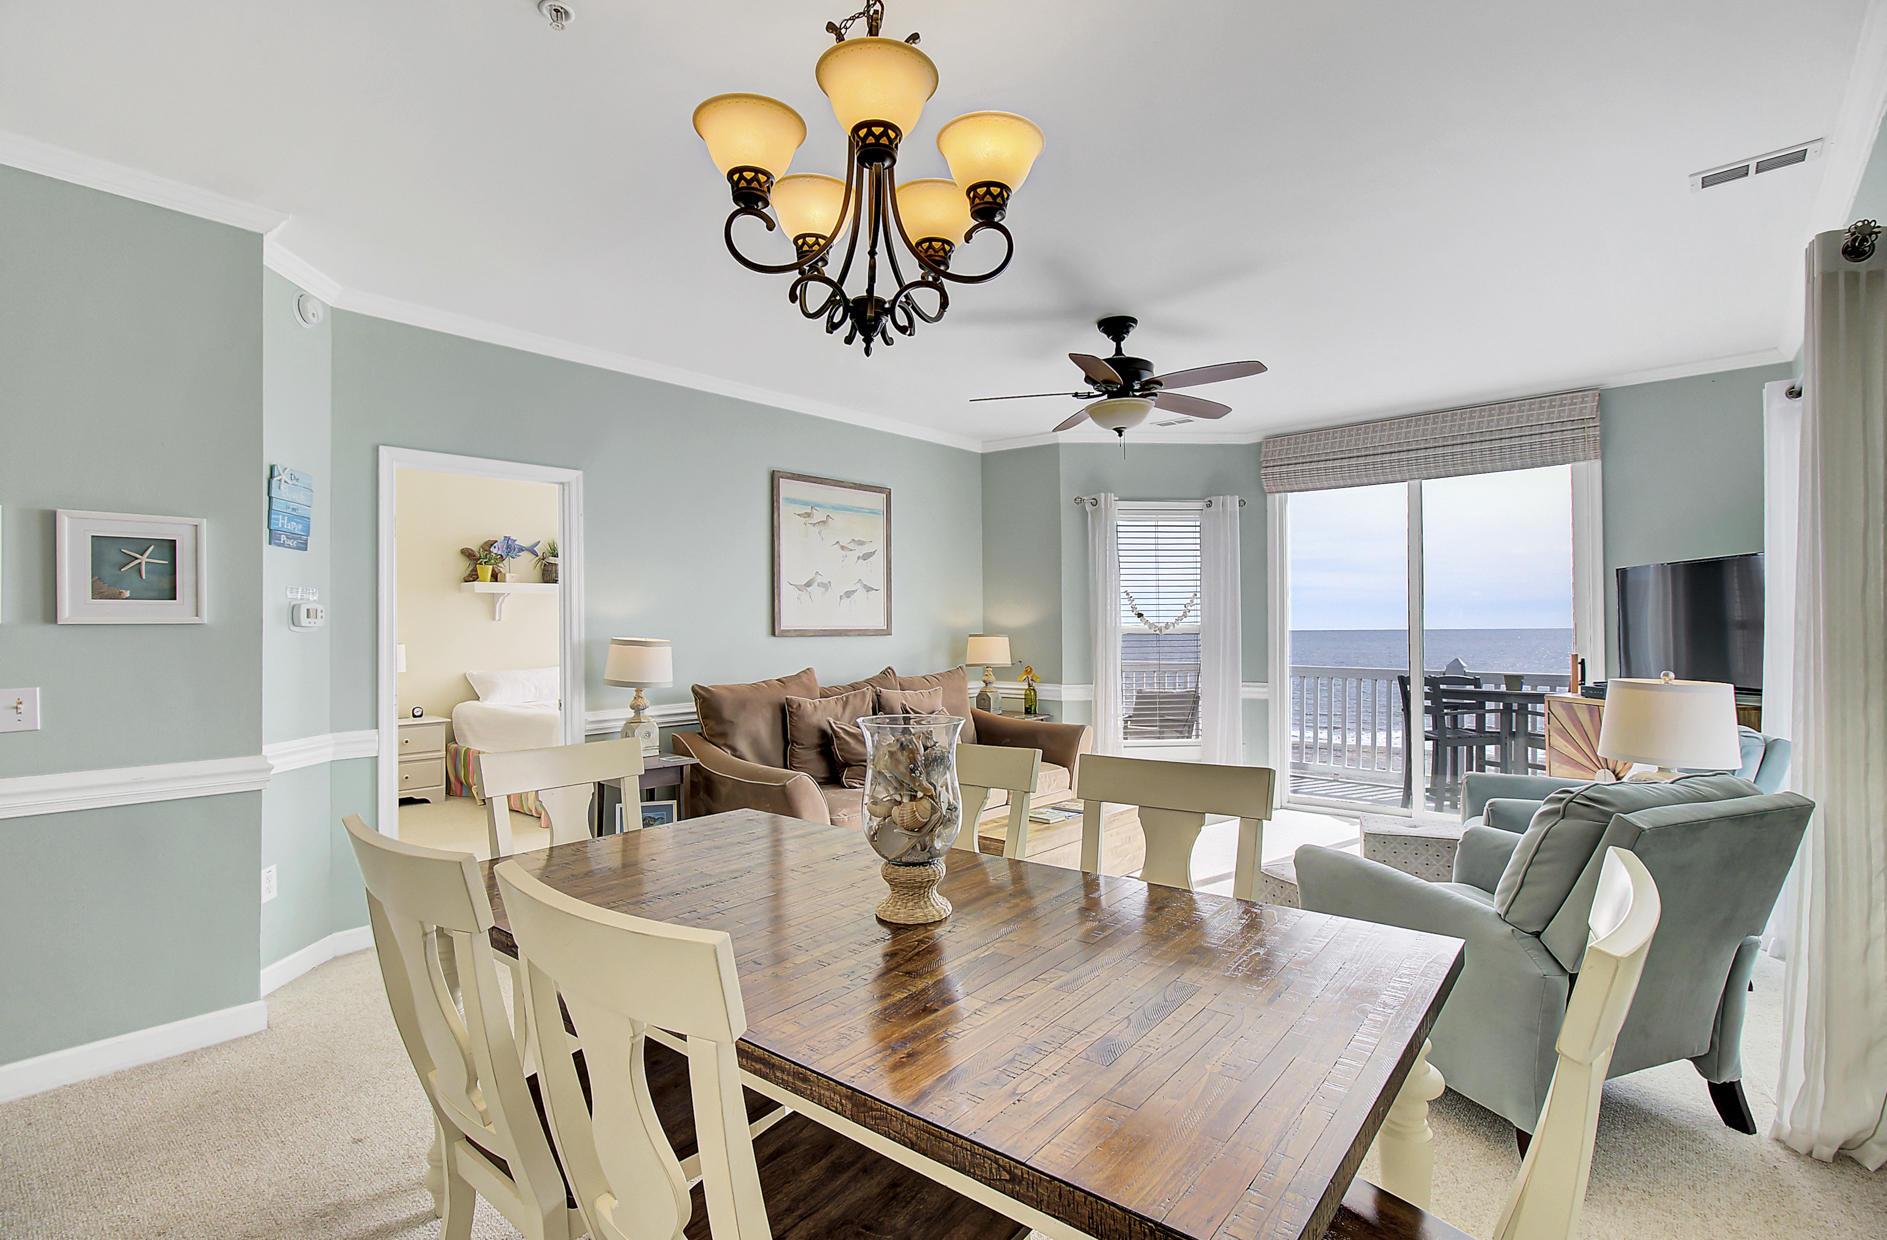 Seaside Villas I Homes For Sale - 111 Arctic, Folly Beach, SC - 5